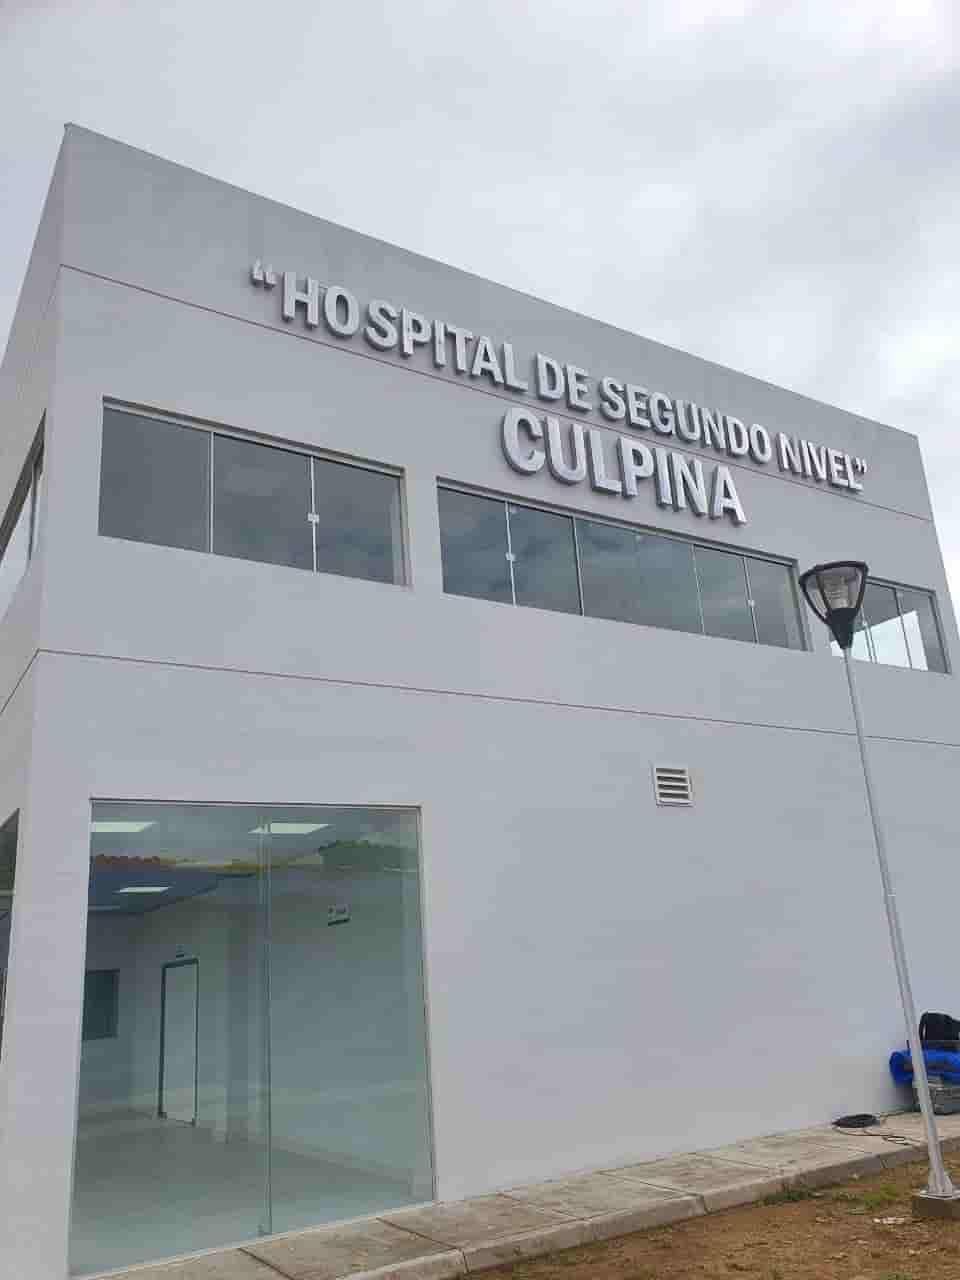 Hospital segundo nivel Culpina